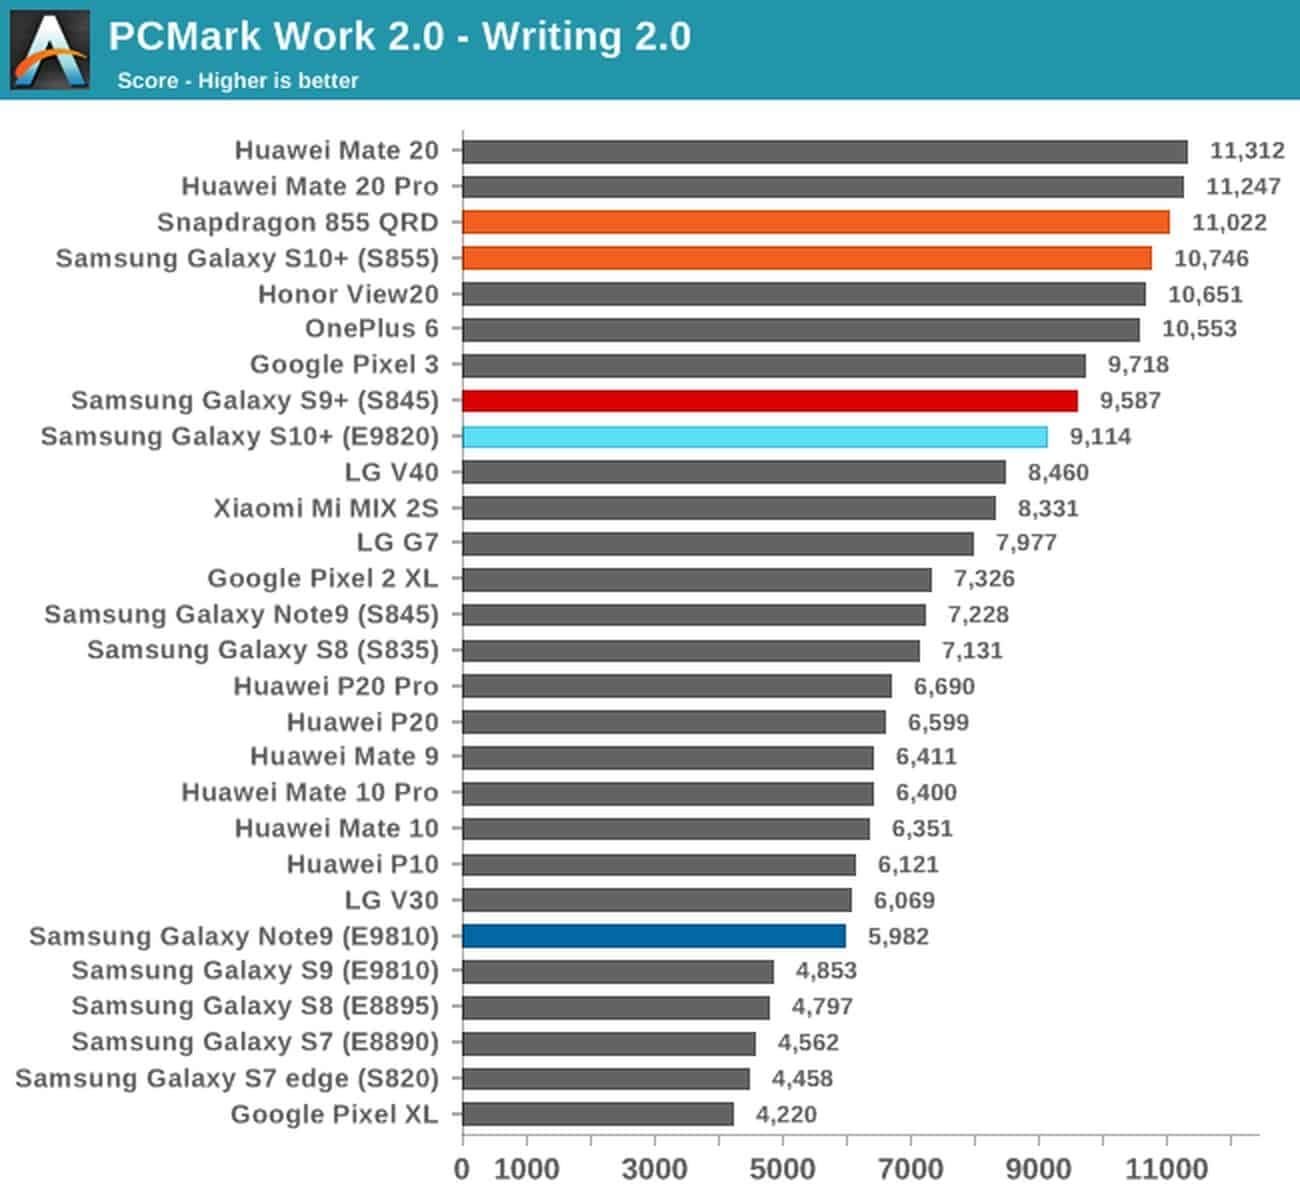 PCMark Galaxy S10 both SoC variants 3